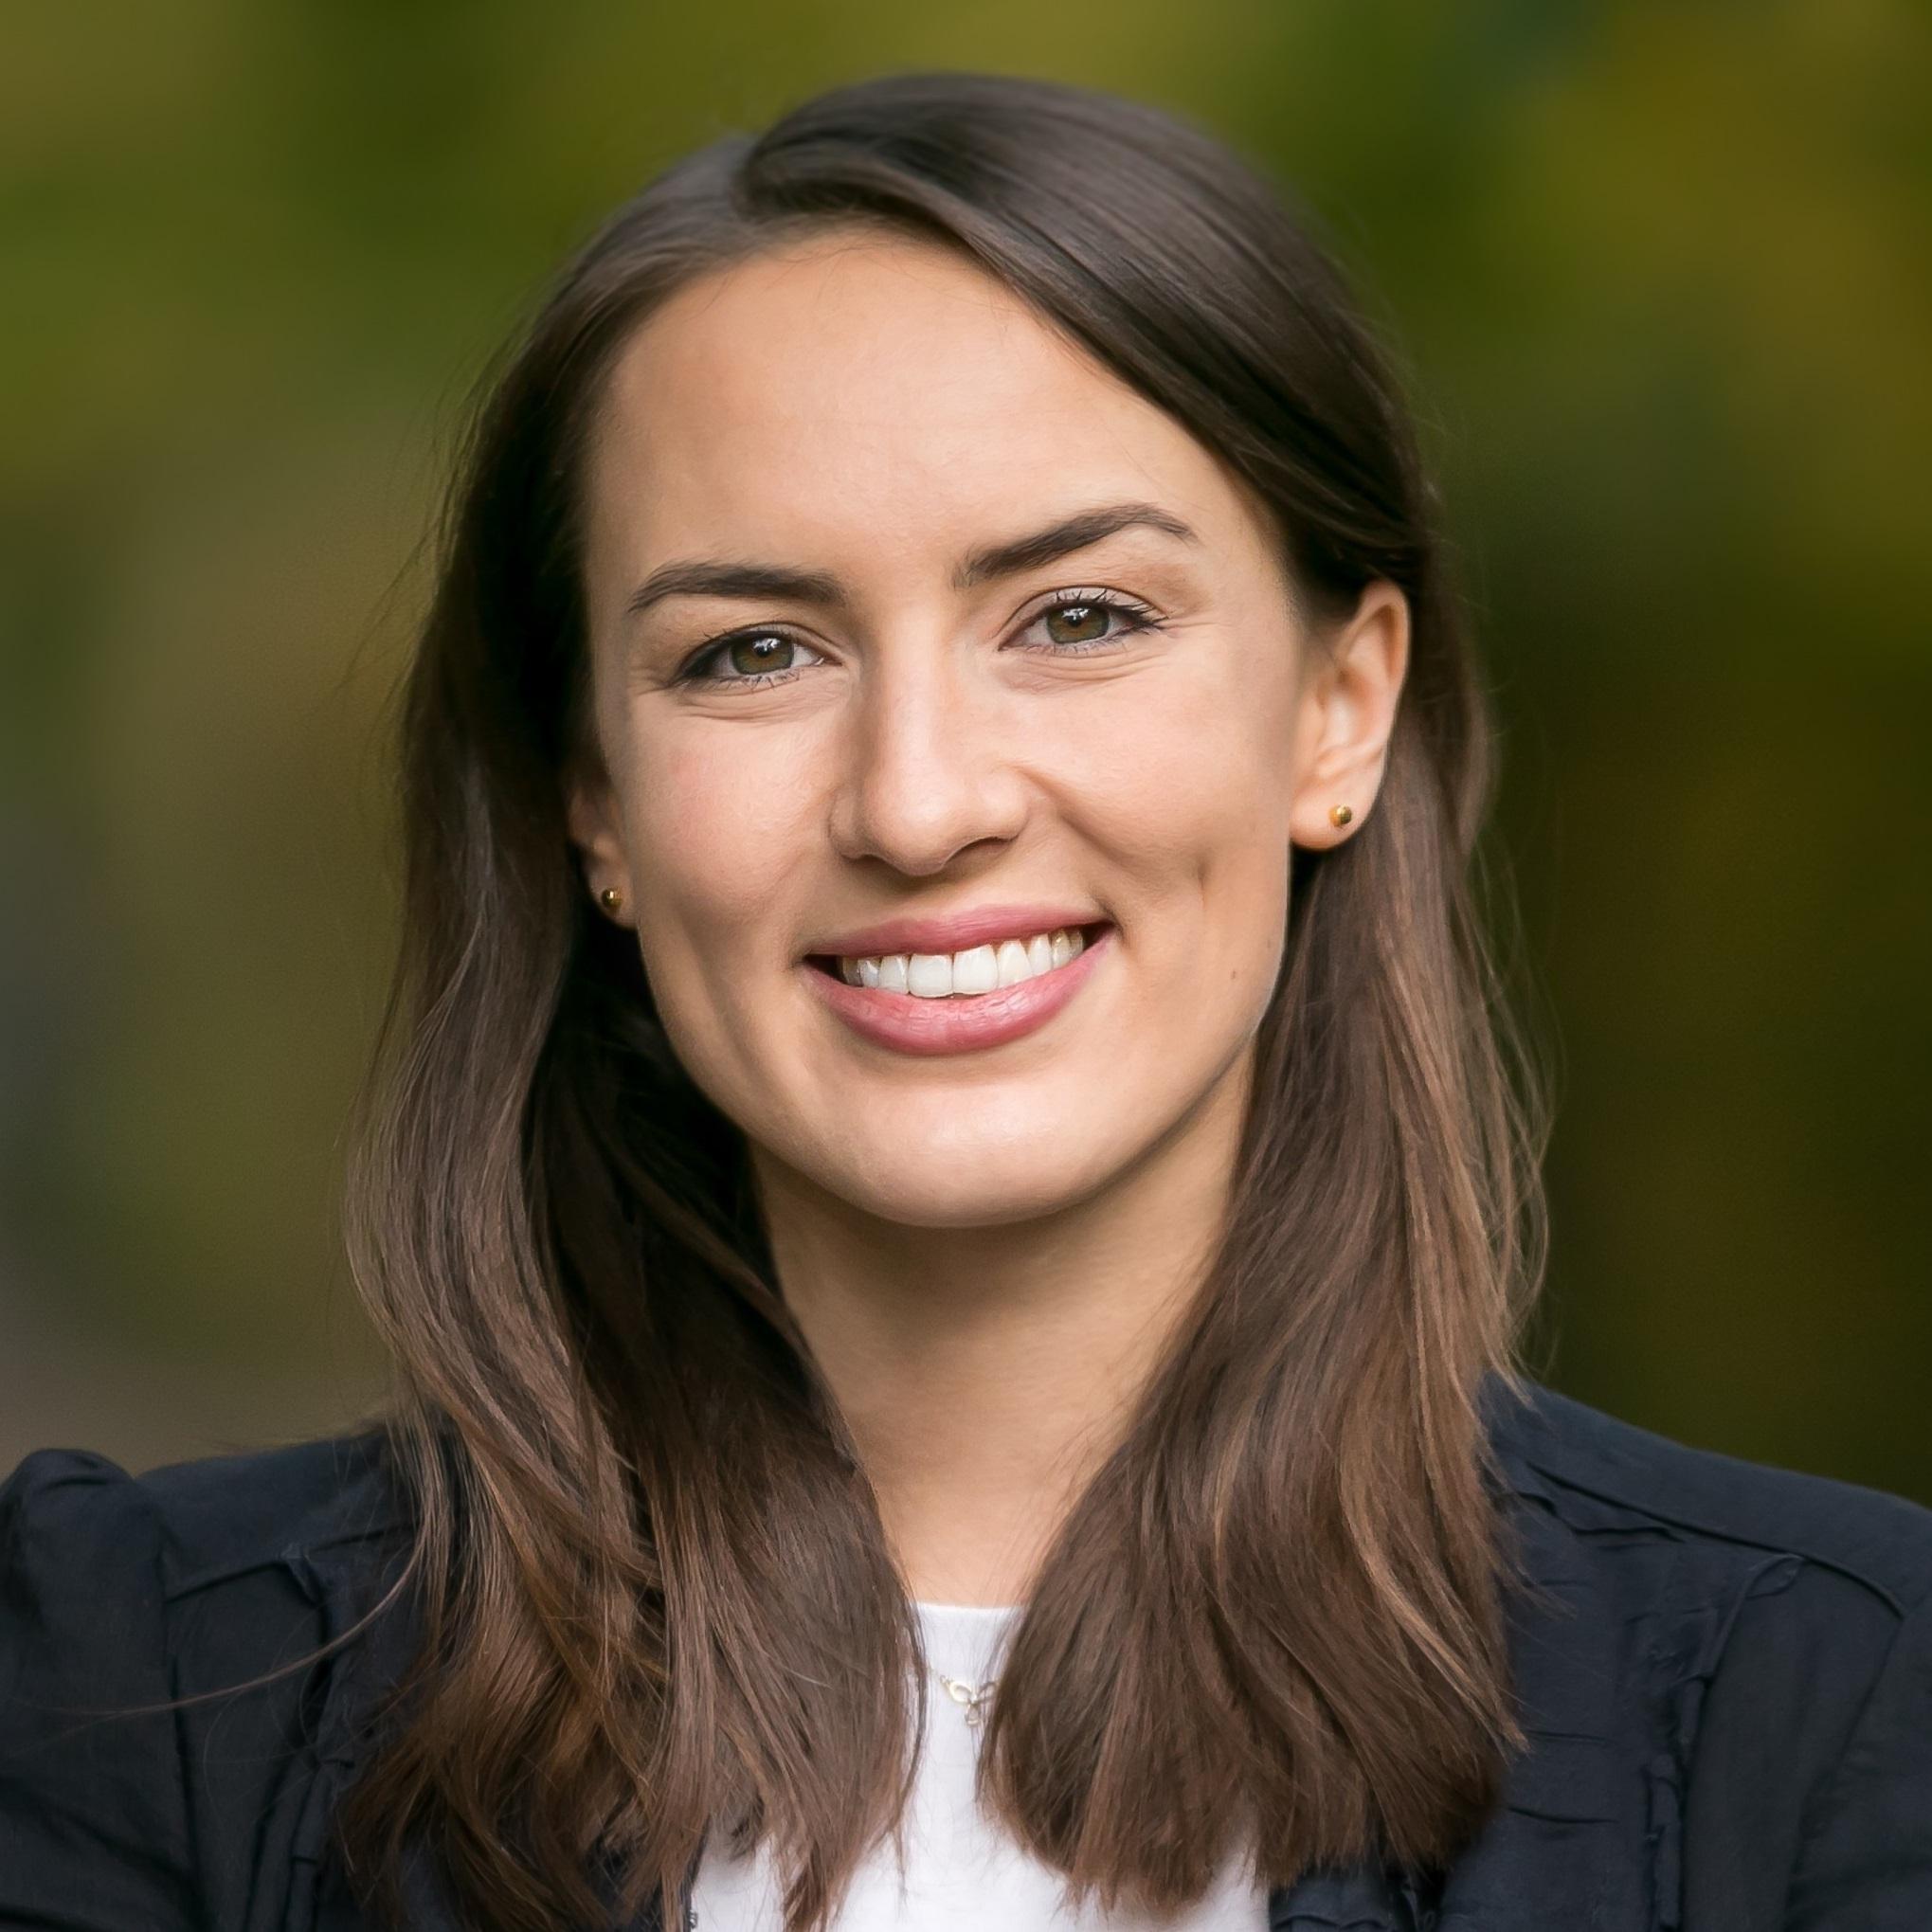 Laura reiner - Board Member, Public Relations, Advocacy